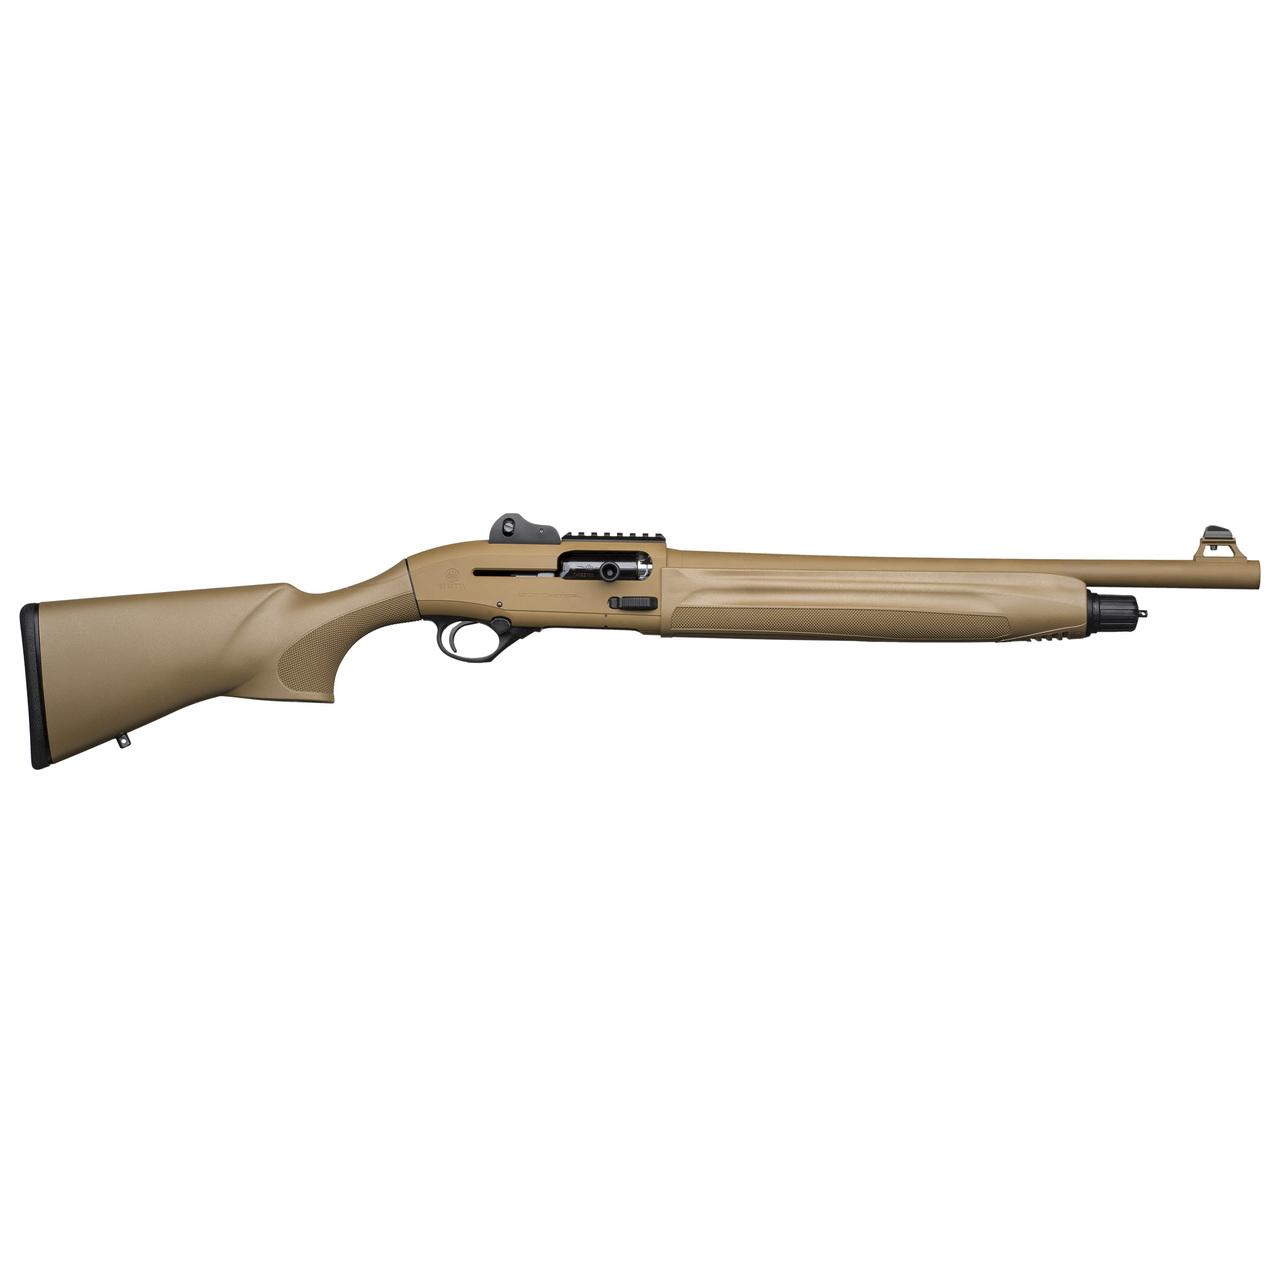 Beretta 1301 Tactical Shotgun FDE